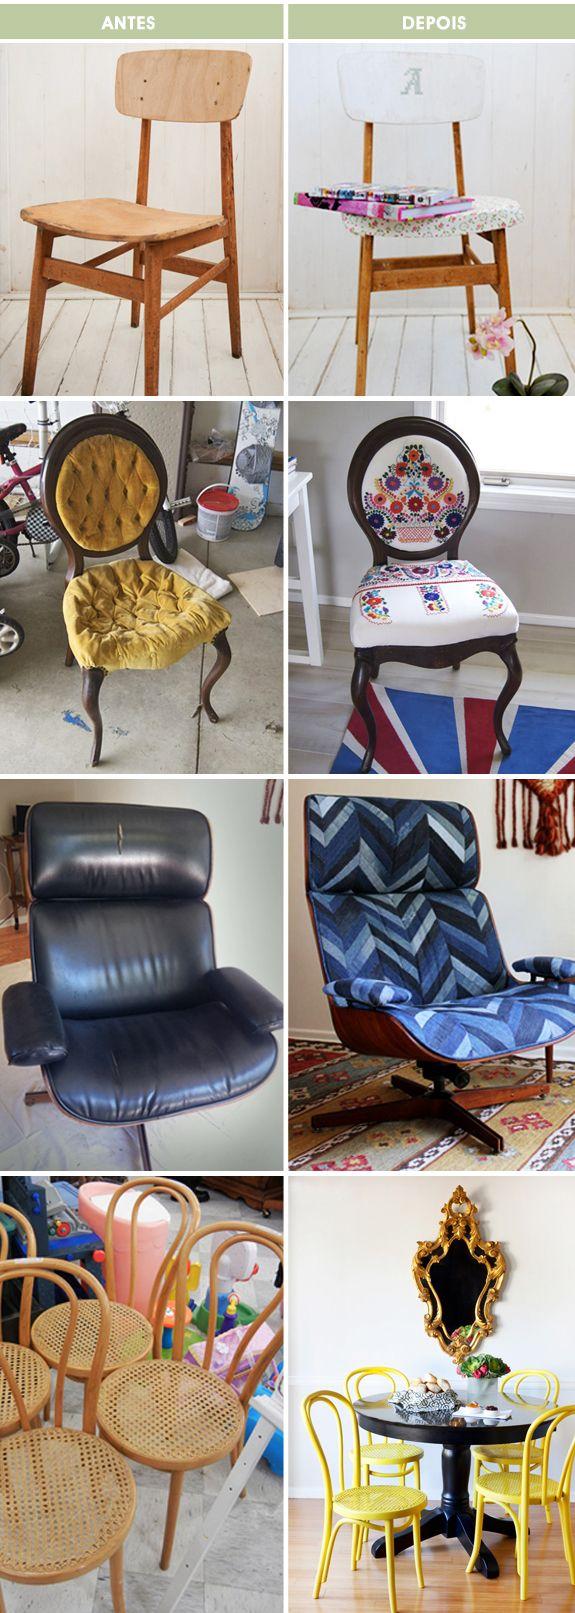 DIY furniture remakes